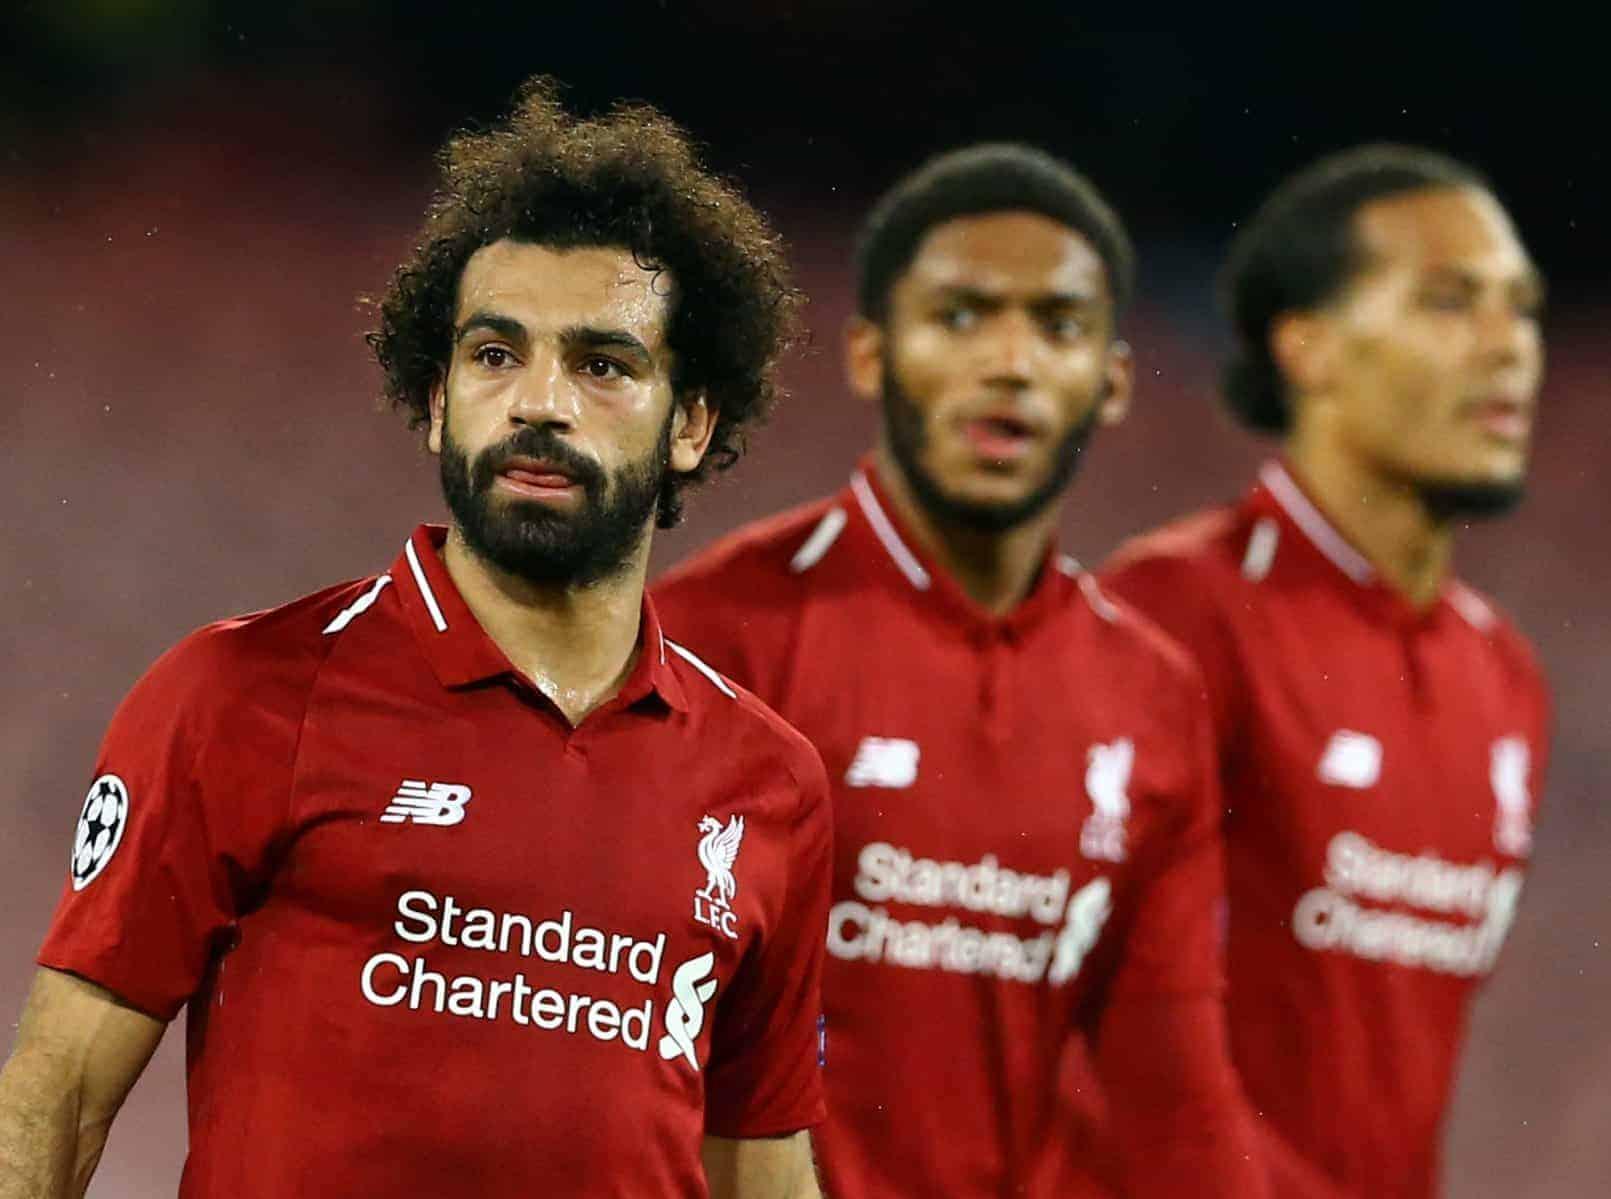 General players - Mohamed Salah, Joe Gomez and Virgil Van Dijk of Liverpool (Photo by Matteo Ciambelli/NurPhoto/Sipa USA)